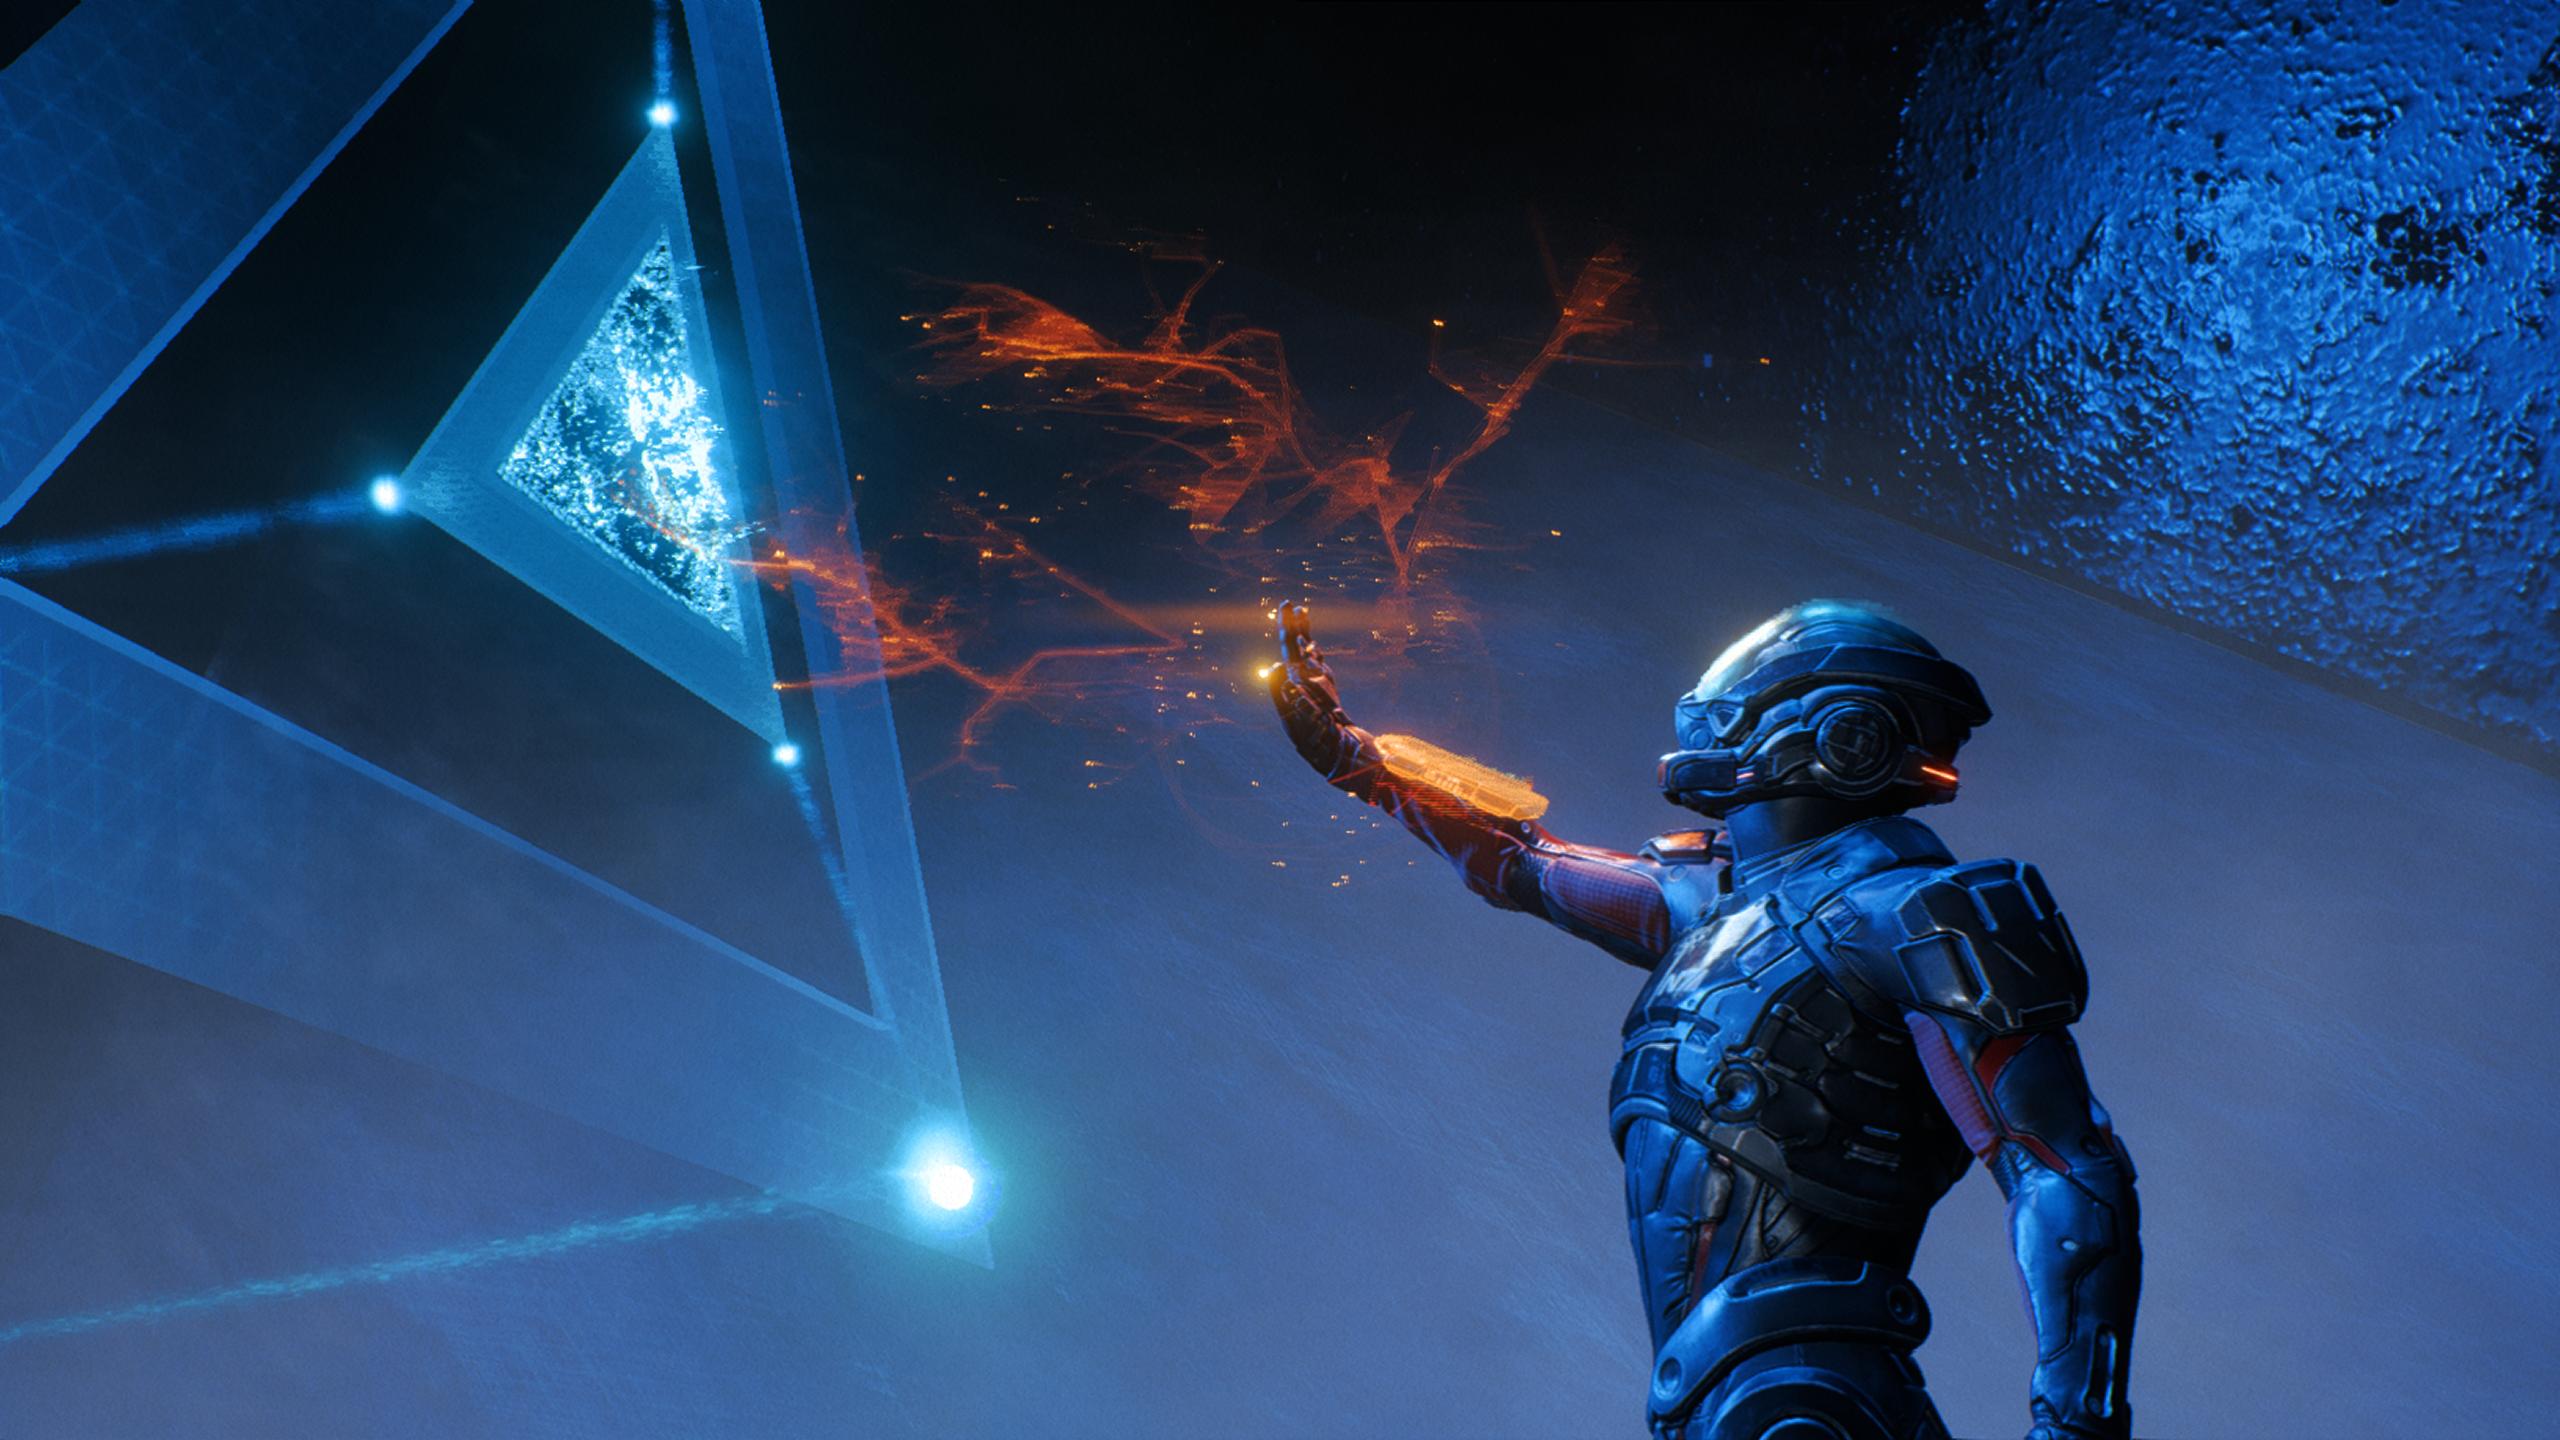 Mass Effect Andromeda Wallpapers: Mass Effect: Andromeda HD Wallpaper